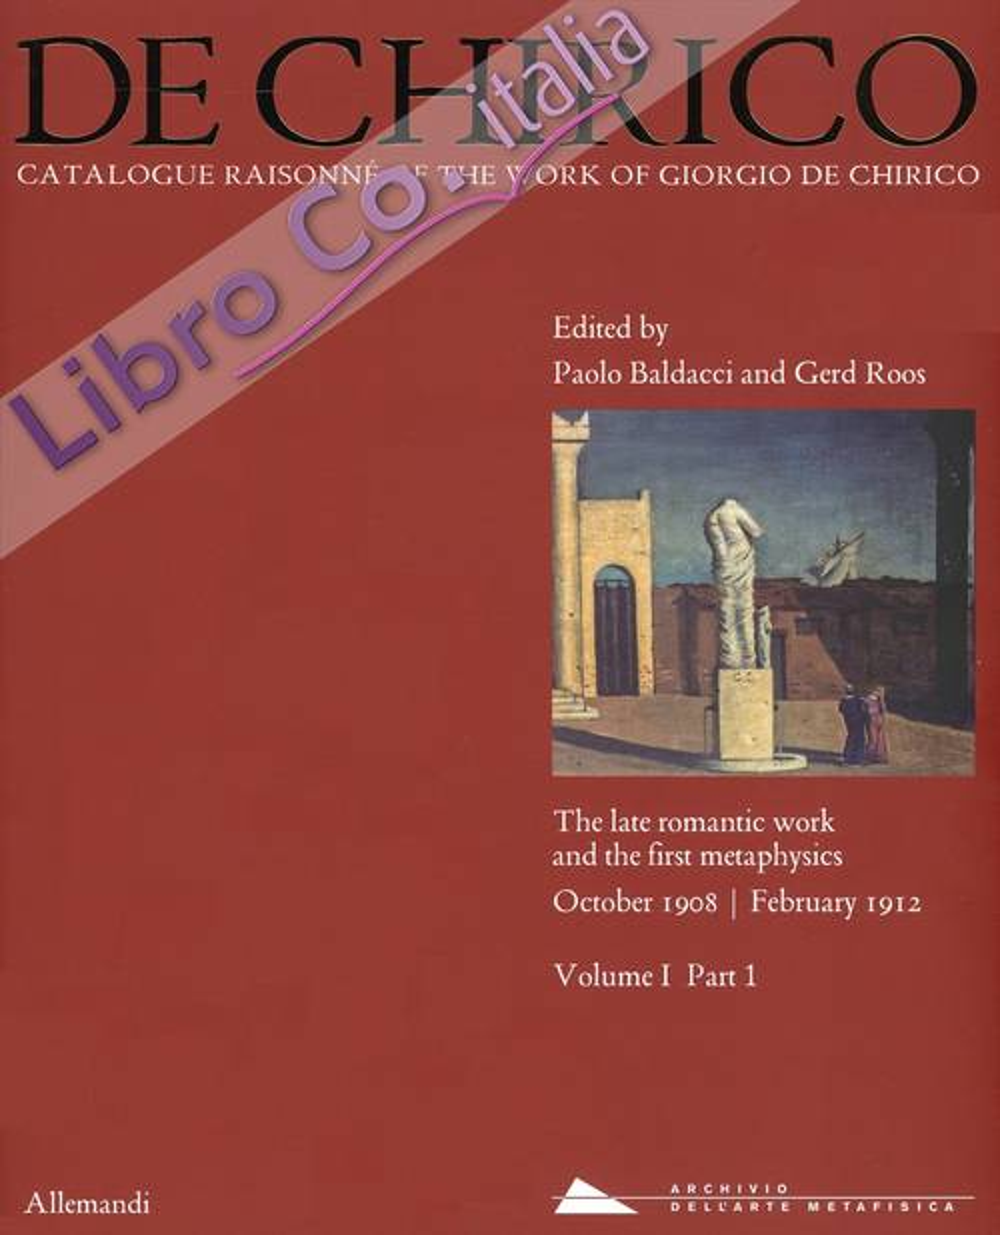 De Chirico. Catalogue Raisonnè of the work of Giorgio De Chirico. The late romantic work and the first mataphysics. October 1908 - February 1912. Vol. I. Tomo 1